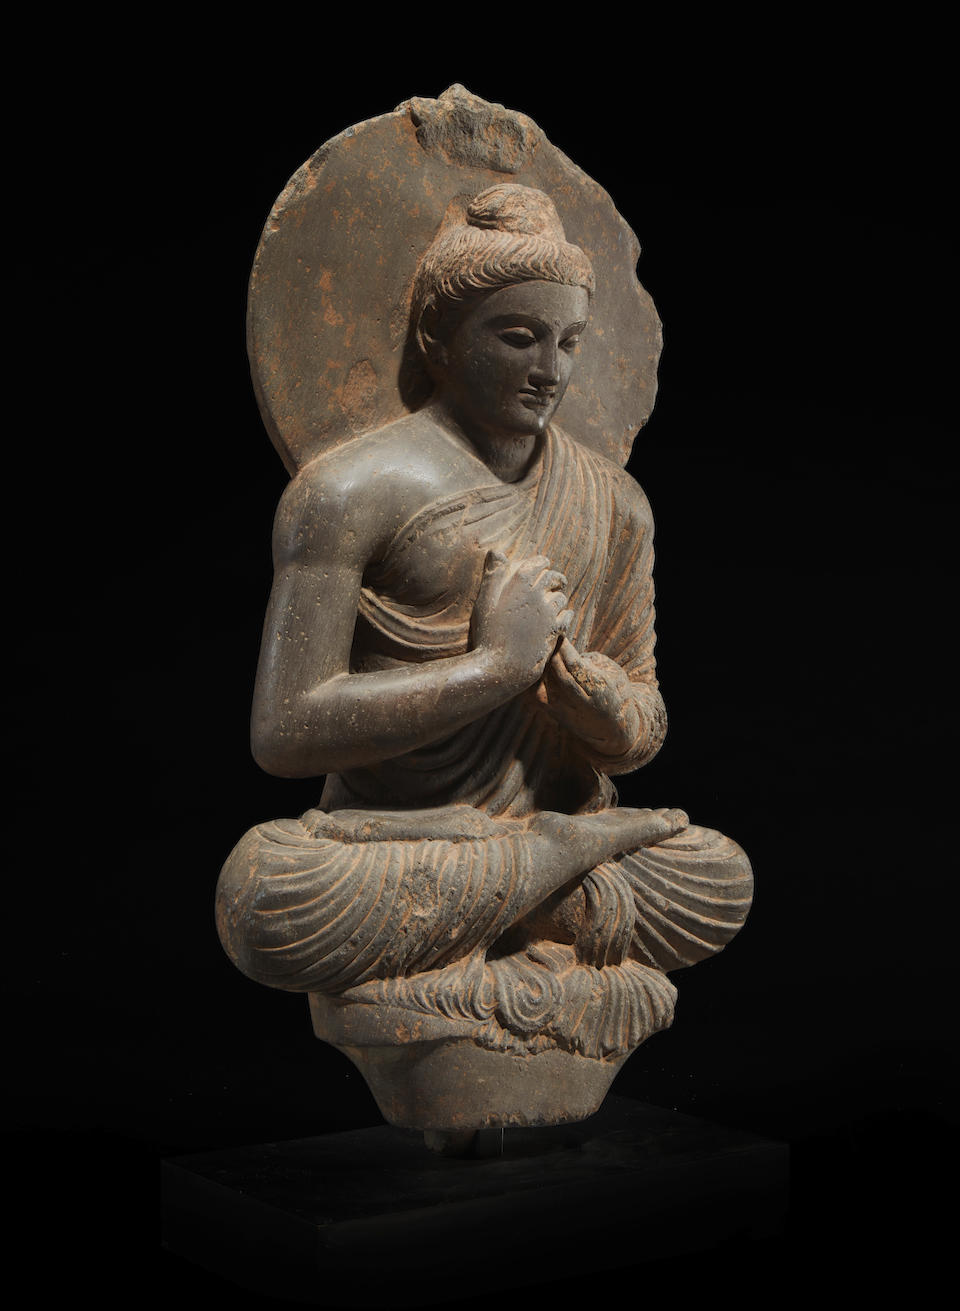 Bonhams A Schist Figure Of Preaching Buddha Ancient Region Of Gandhara 3rd 4th Century